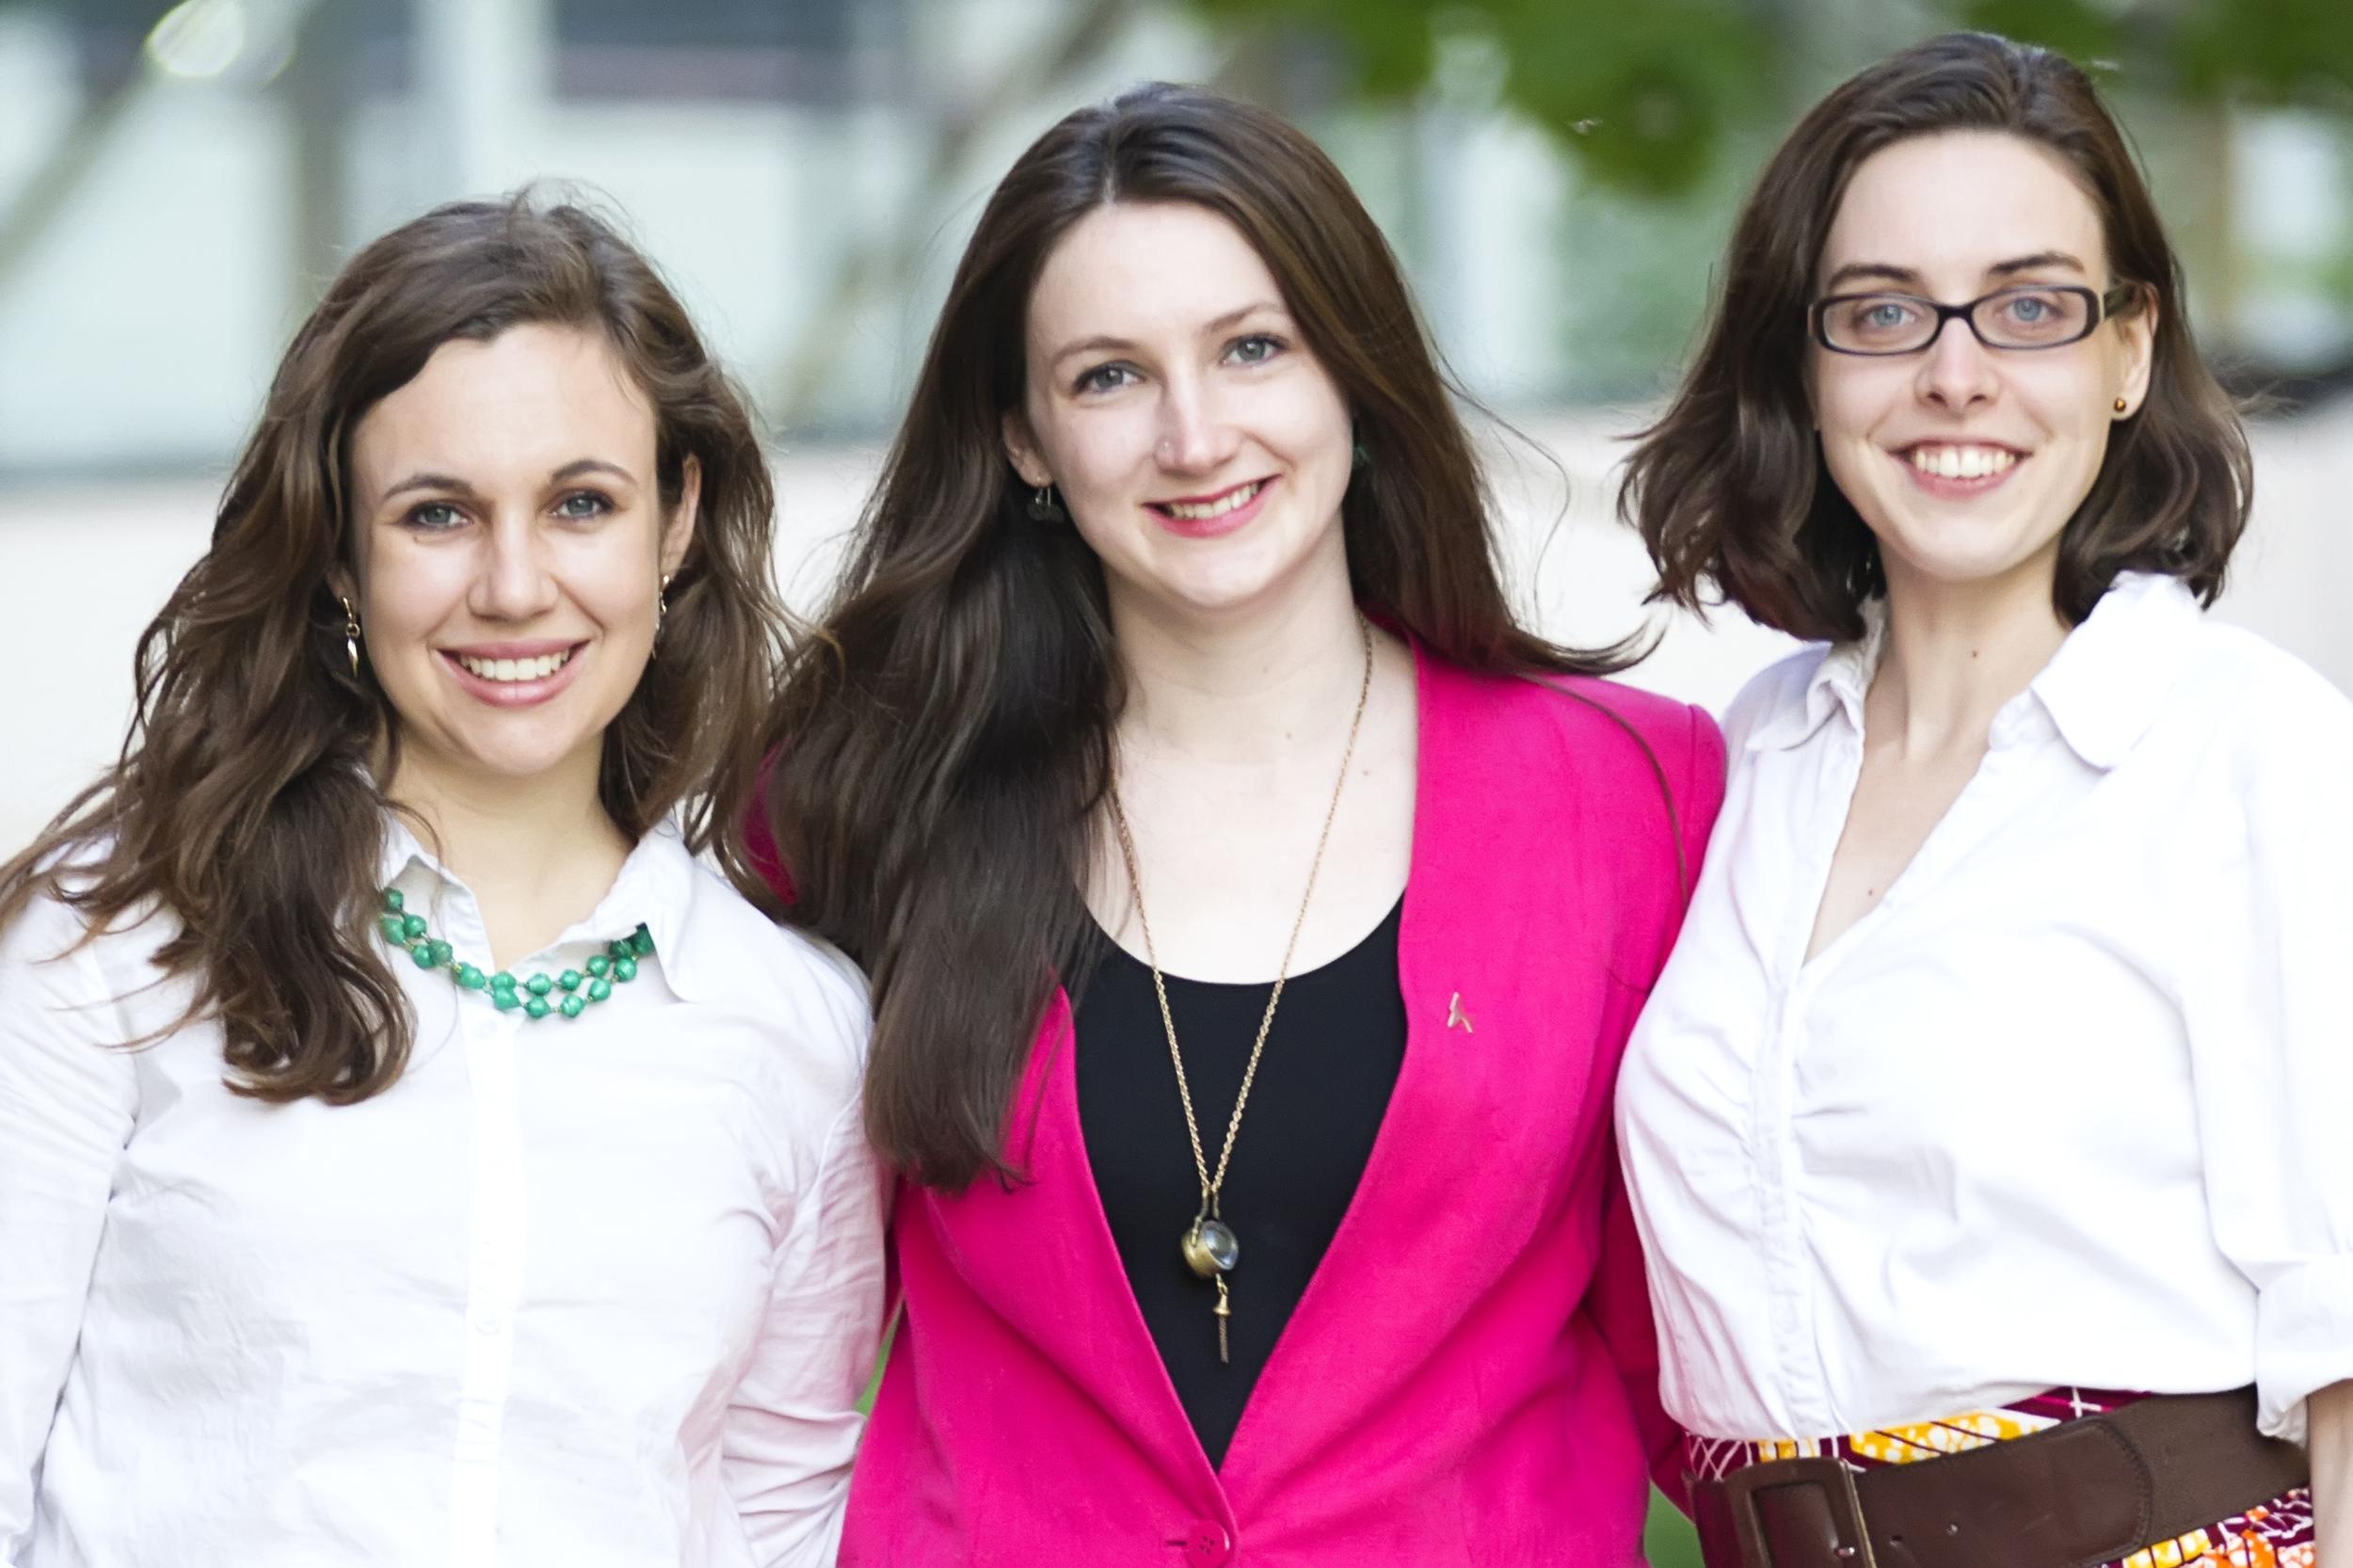 Sisu's C-Suite: Katherine Kirsch (CMO), Carolyn Yarina (CEO), and Gillian Henker (CTO)